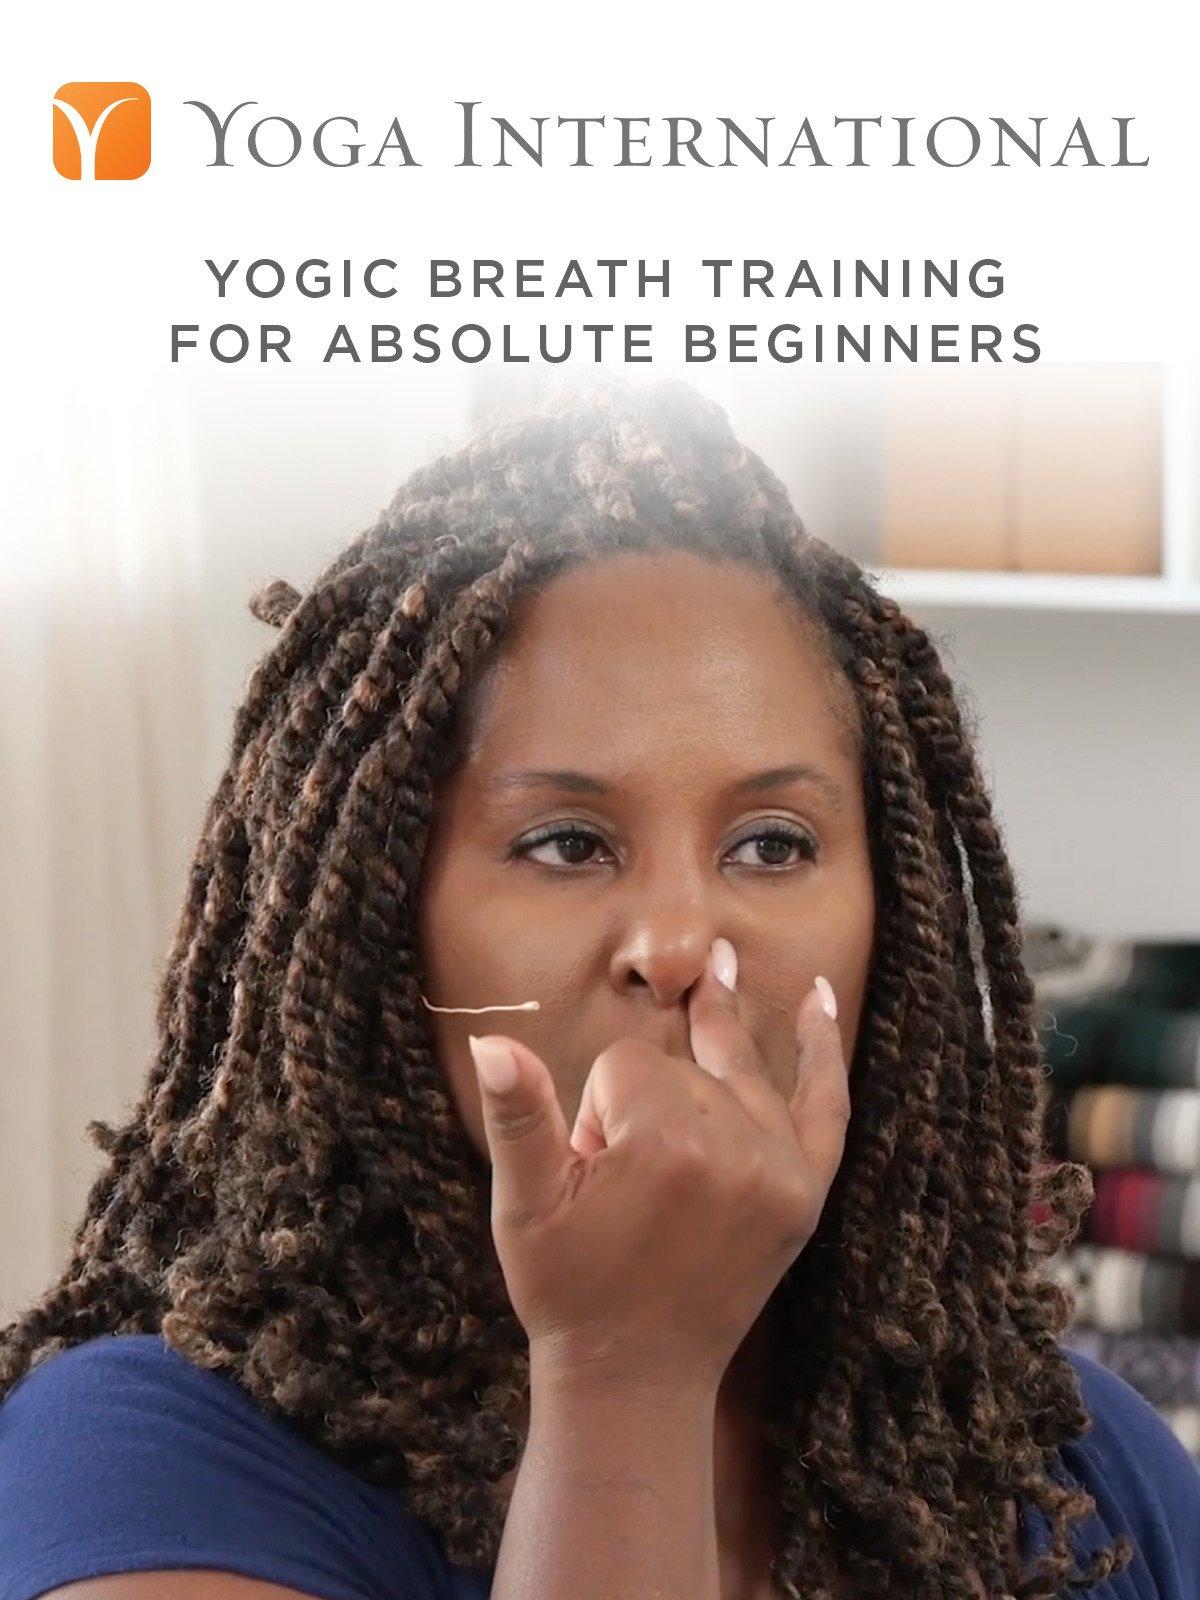 Yogic Breath Training for Absolute Beginners